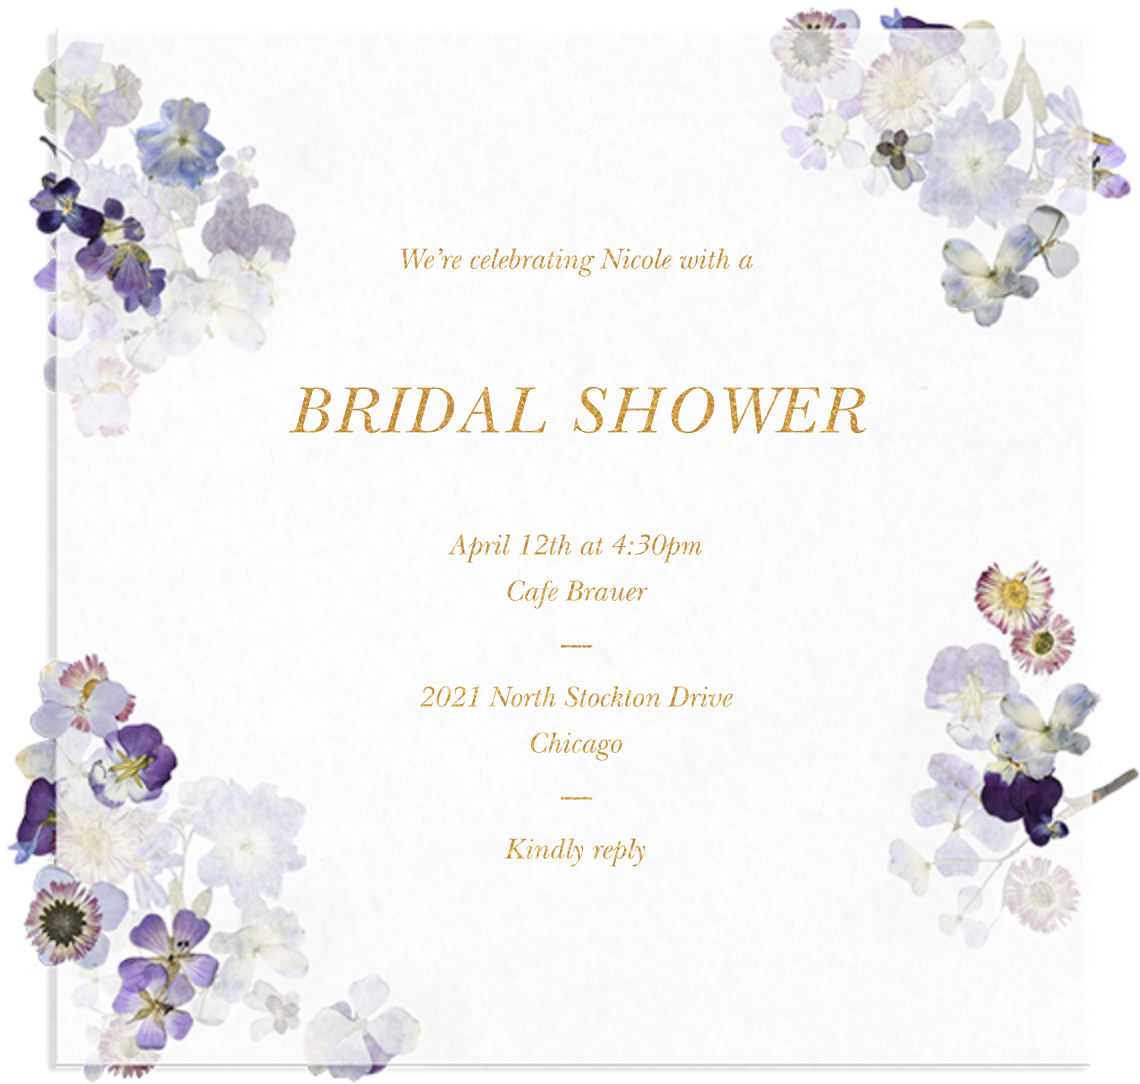 Pressed in Vellum - Paperless Post - Bridal shower